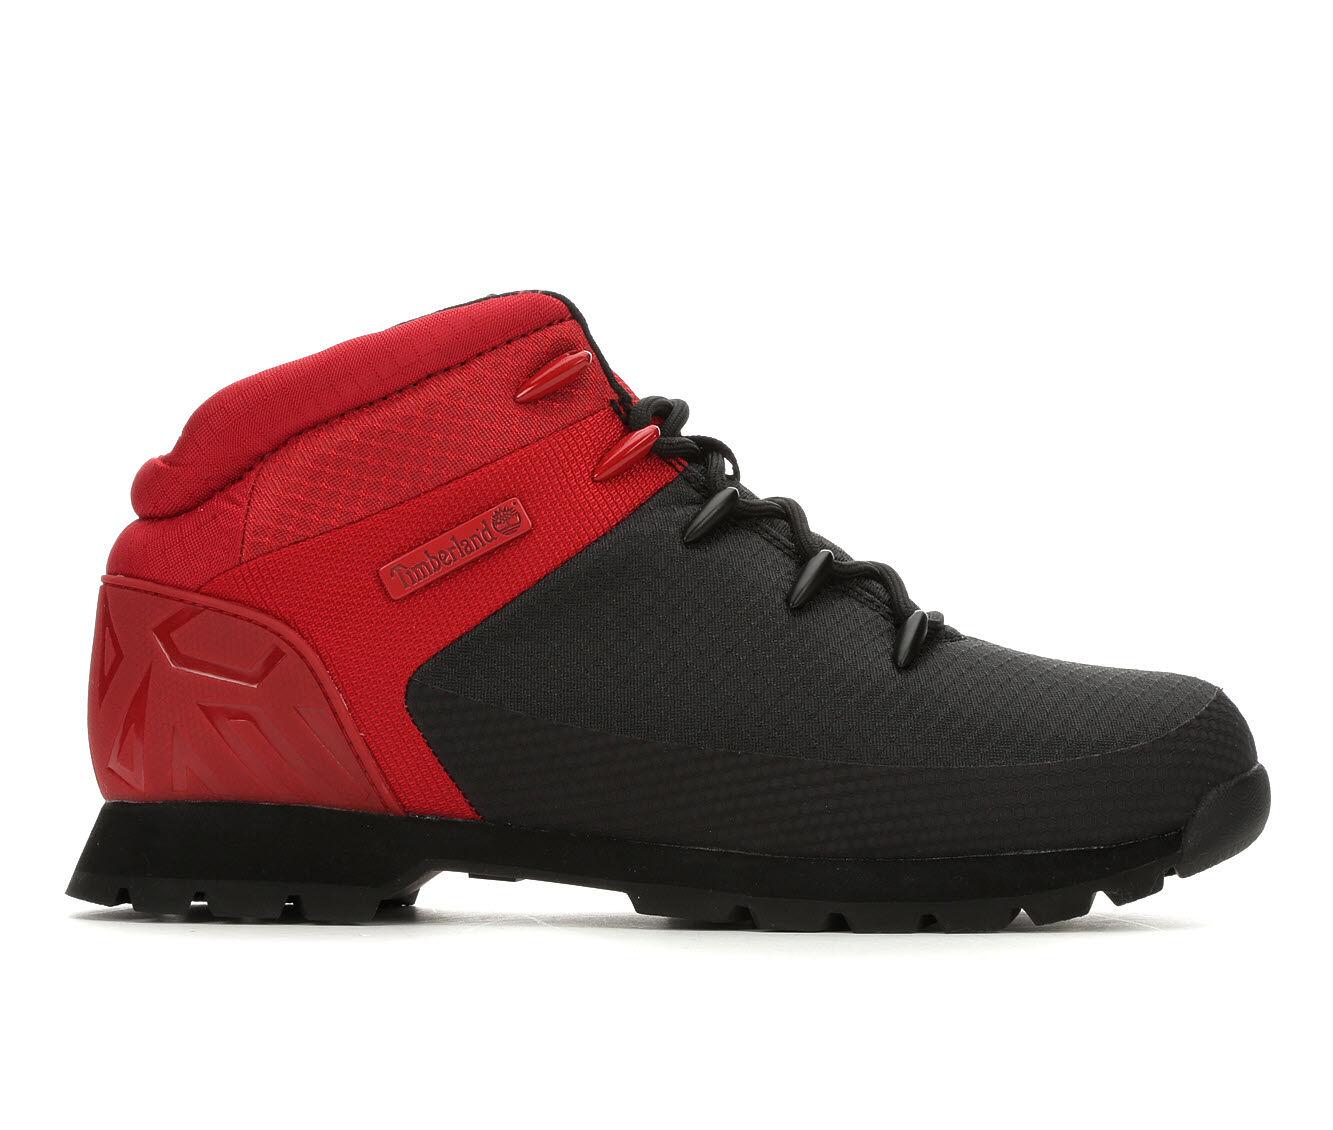 Men's Timberland Euro Sprint Hiker Boots Black/Red Mesh